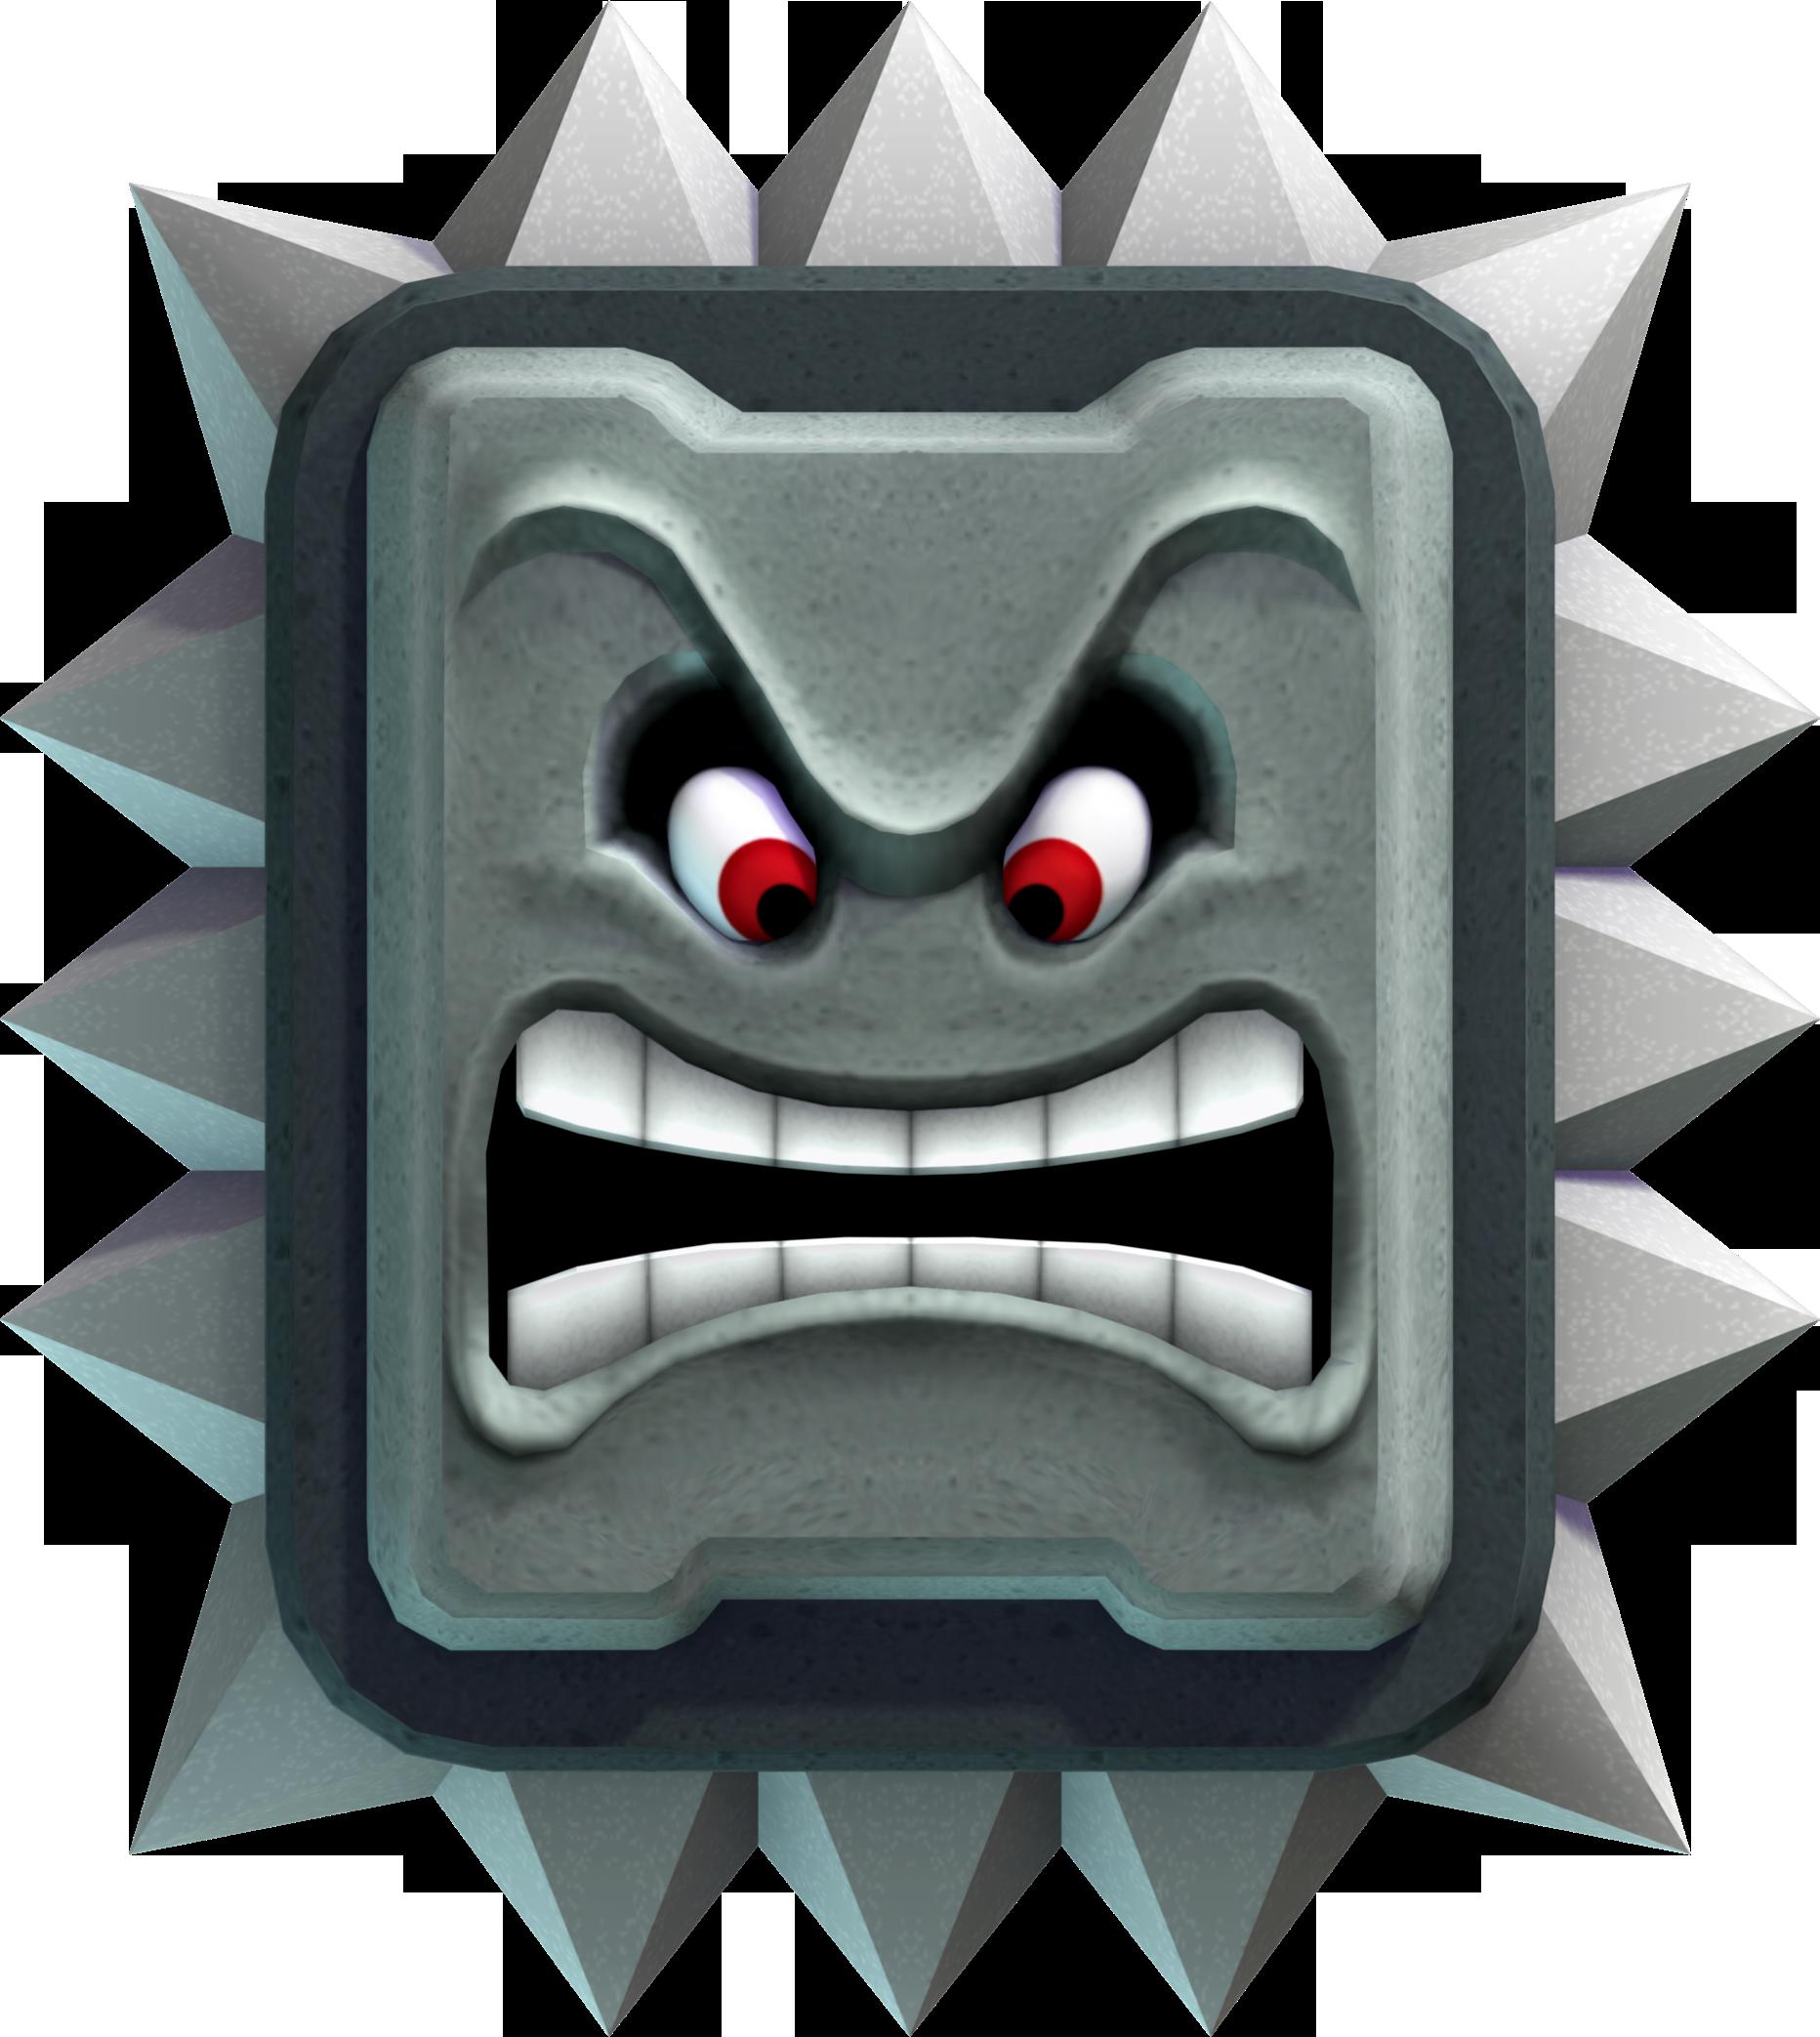 Steinblock | Mario Kart Wiki | FANDOM powered by Wikia